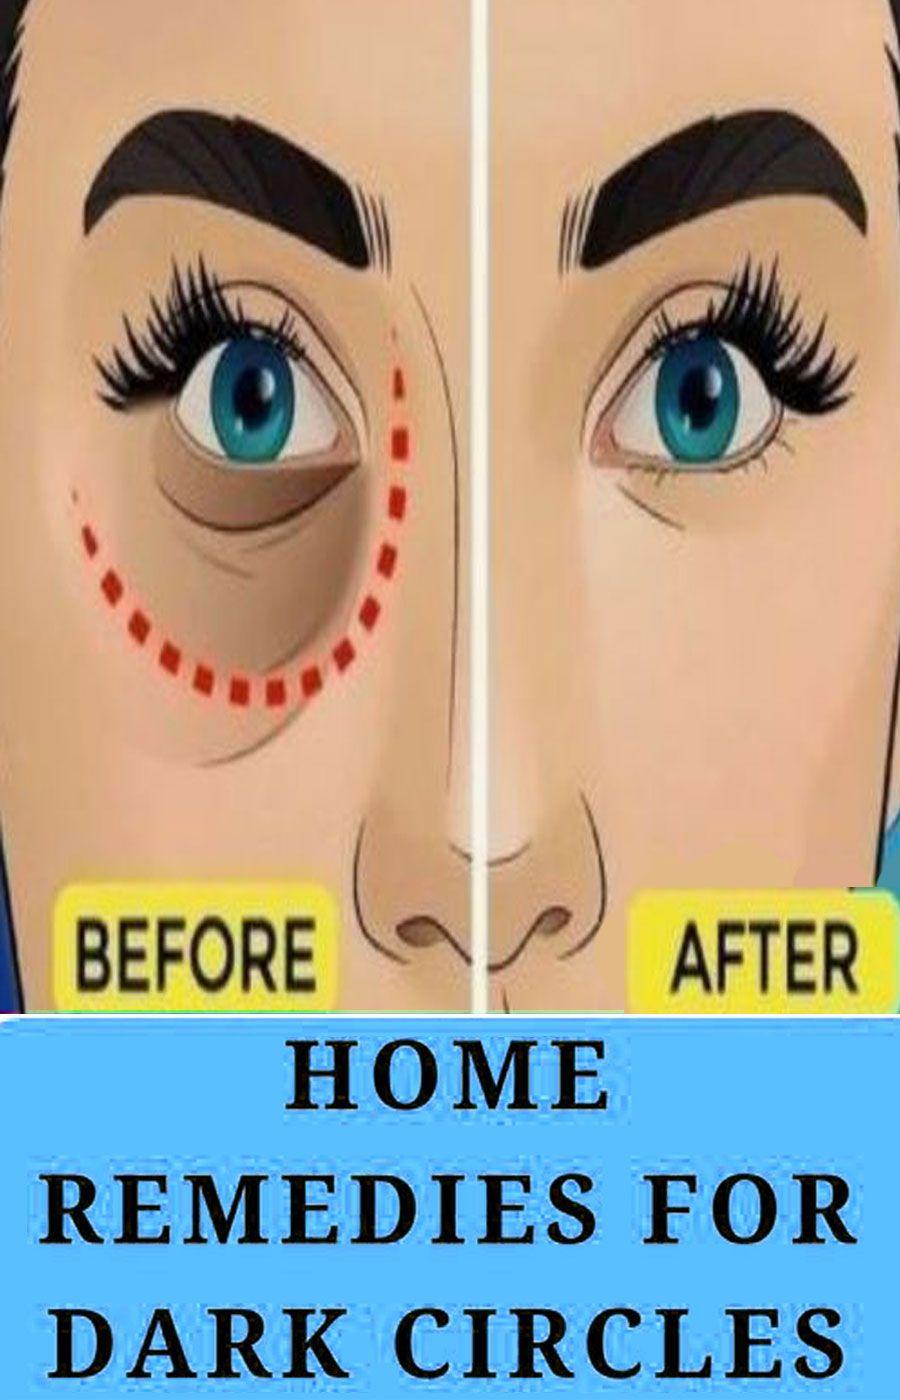 78cd1e2a9a9824ae43357ad47c179b72 - How To Get Rid Of Black Eyes From No Sleep